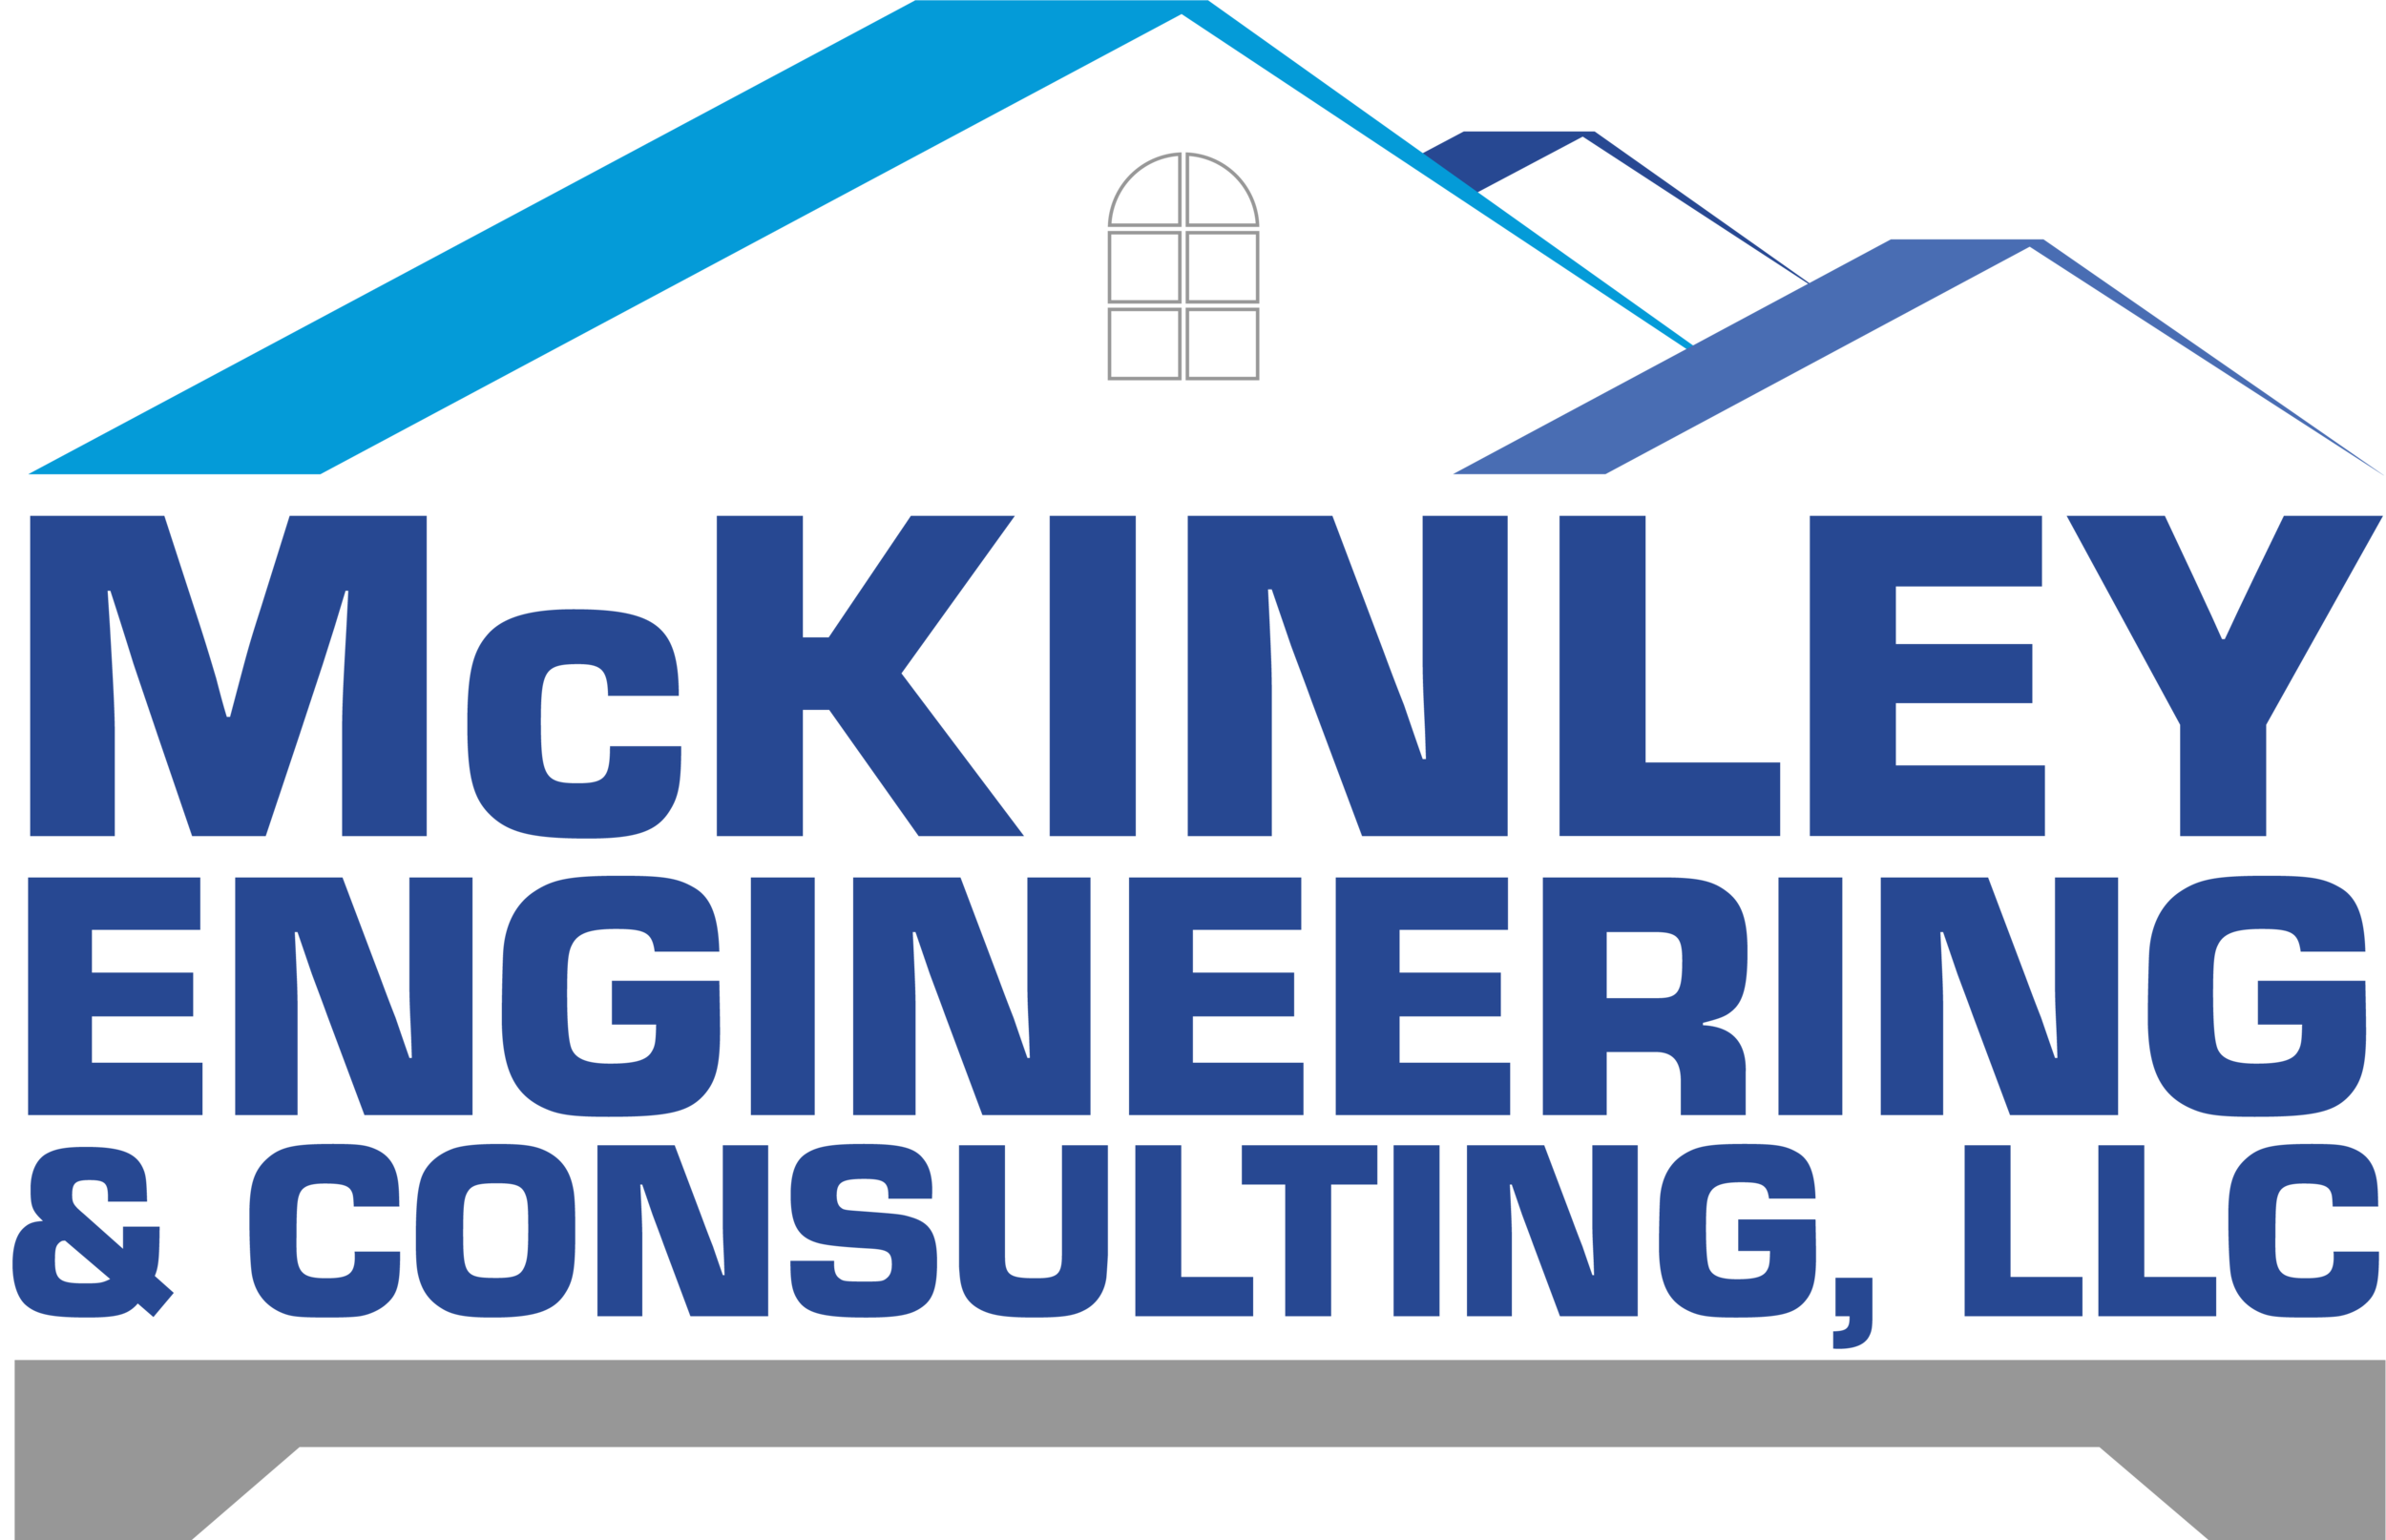 McKinley Engineering